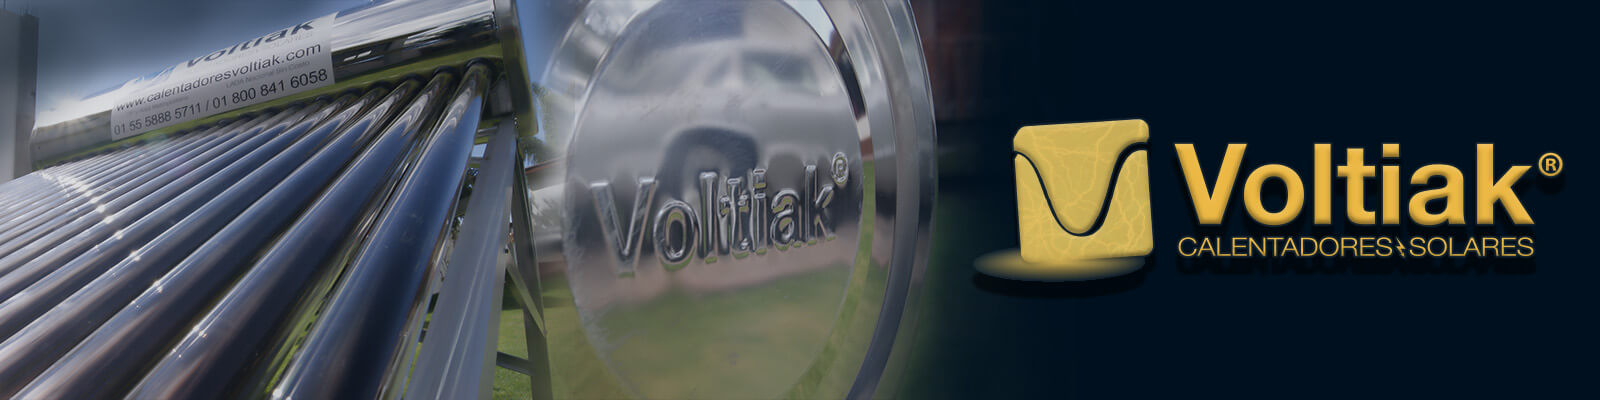 grupo-torices-voltiak-slide